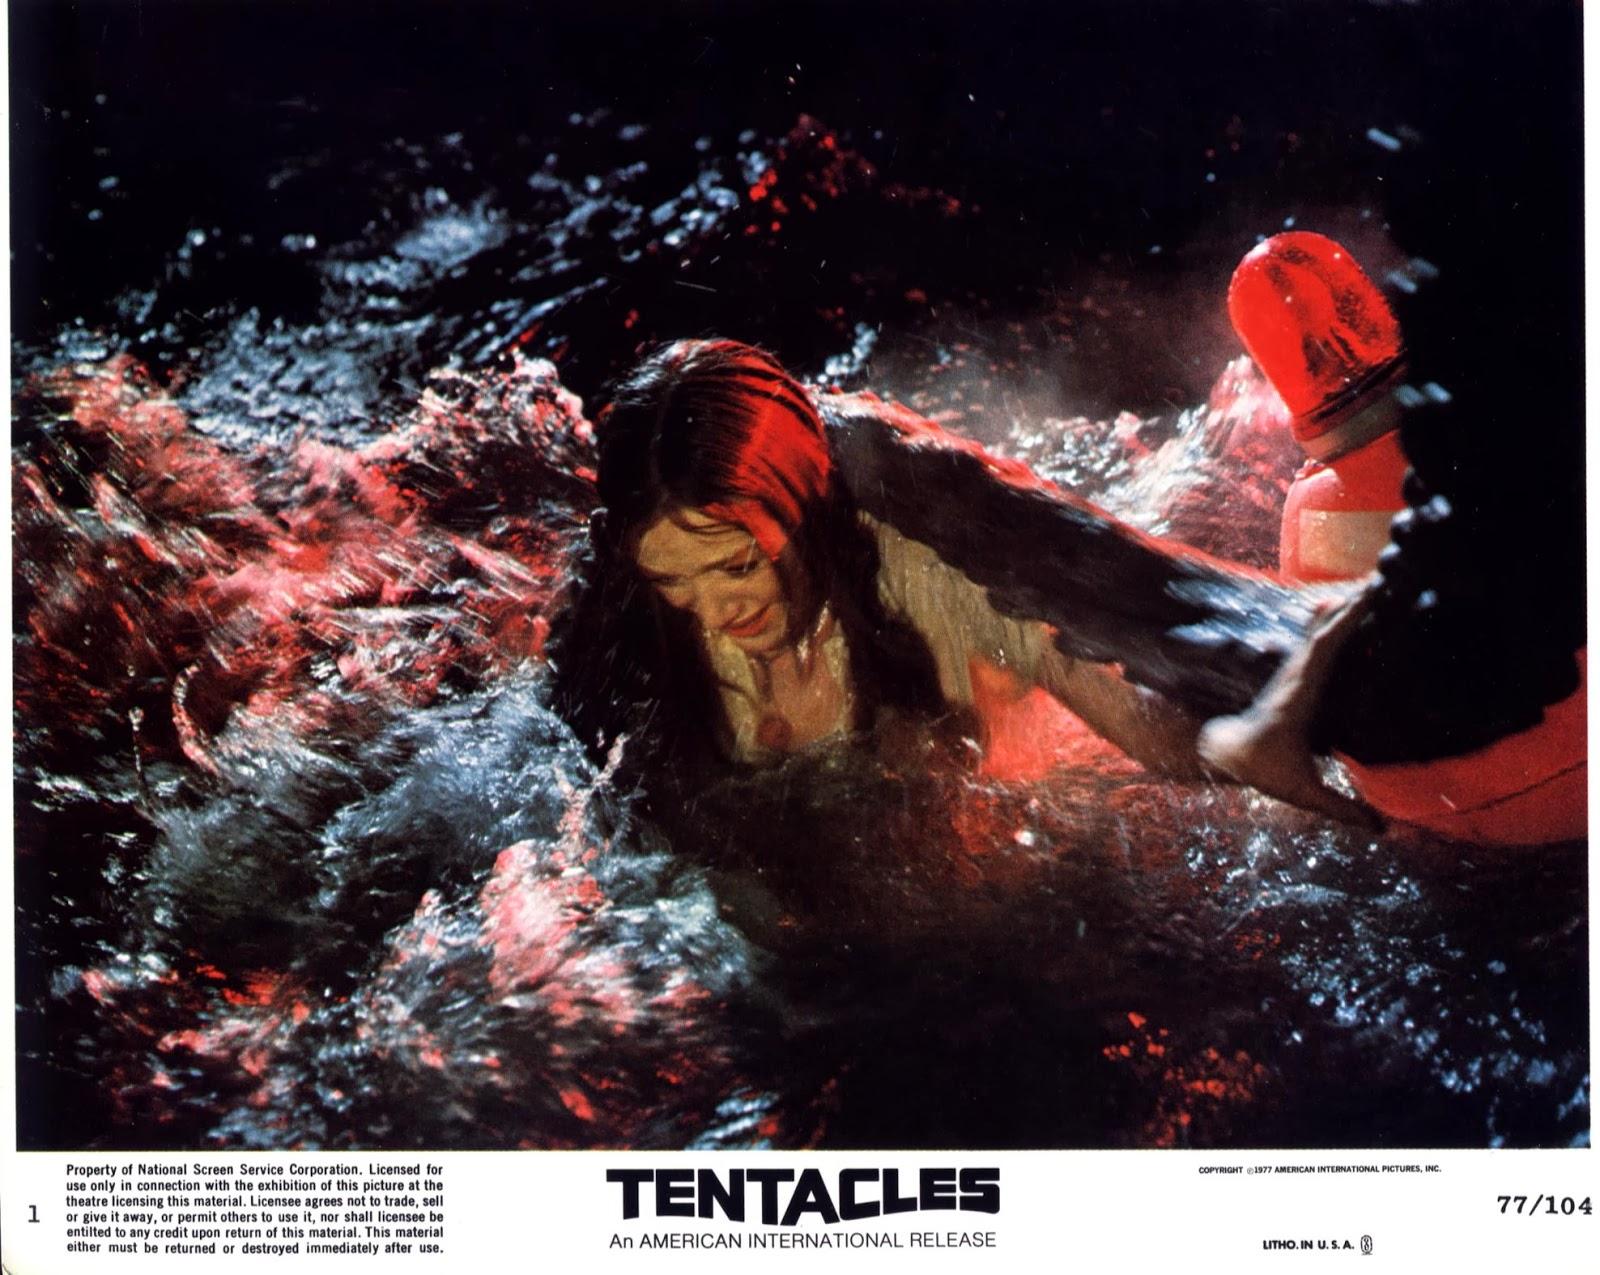 tentacles-sex-movie-dark-sexy-nudes